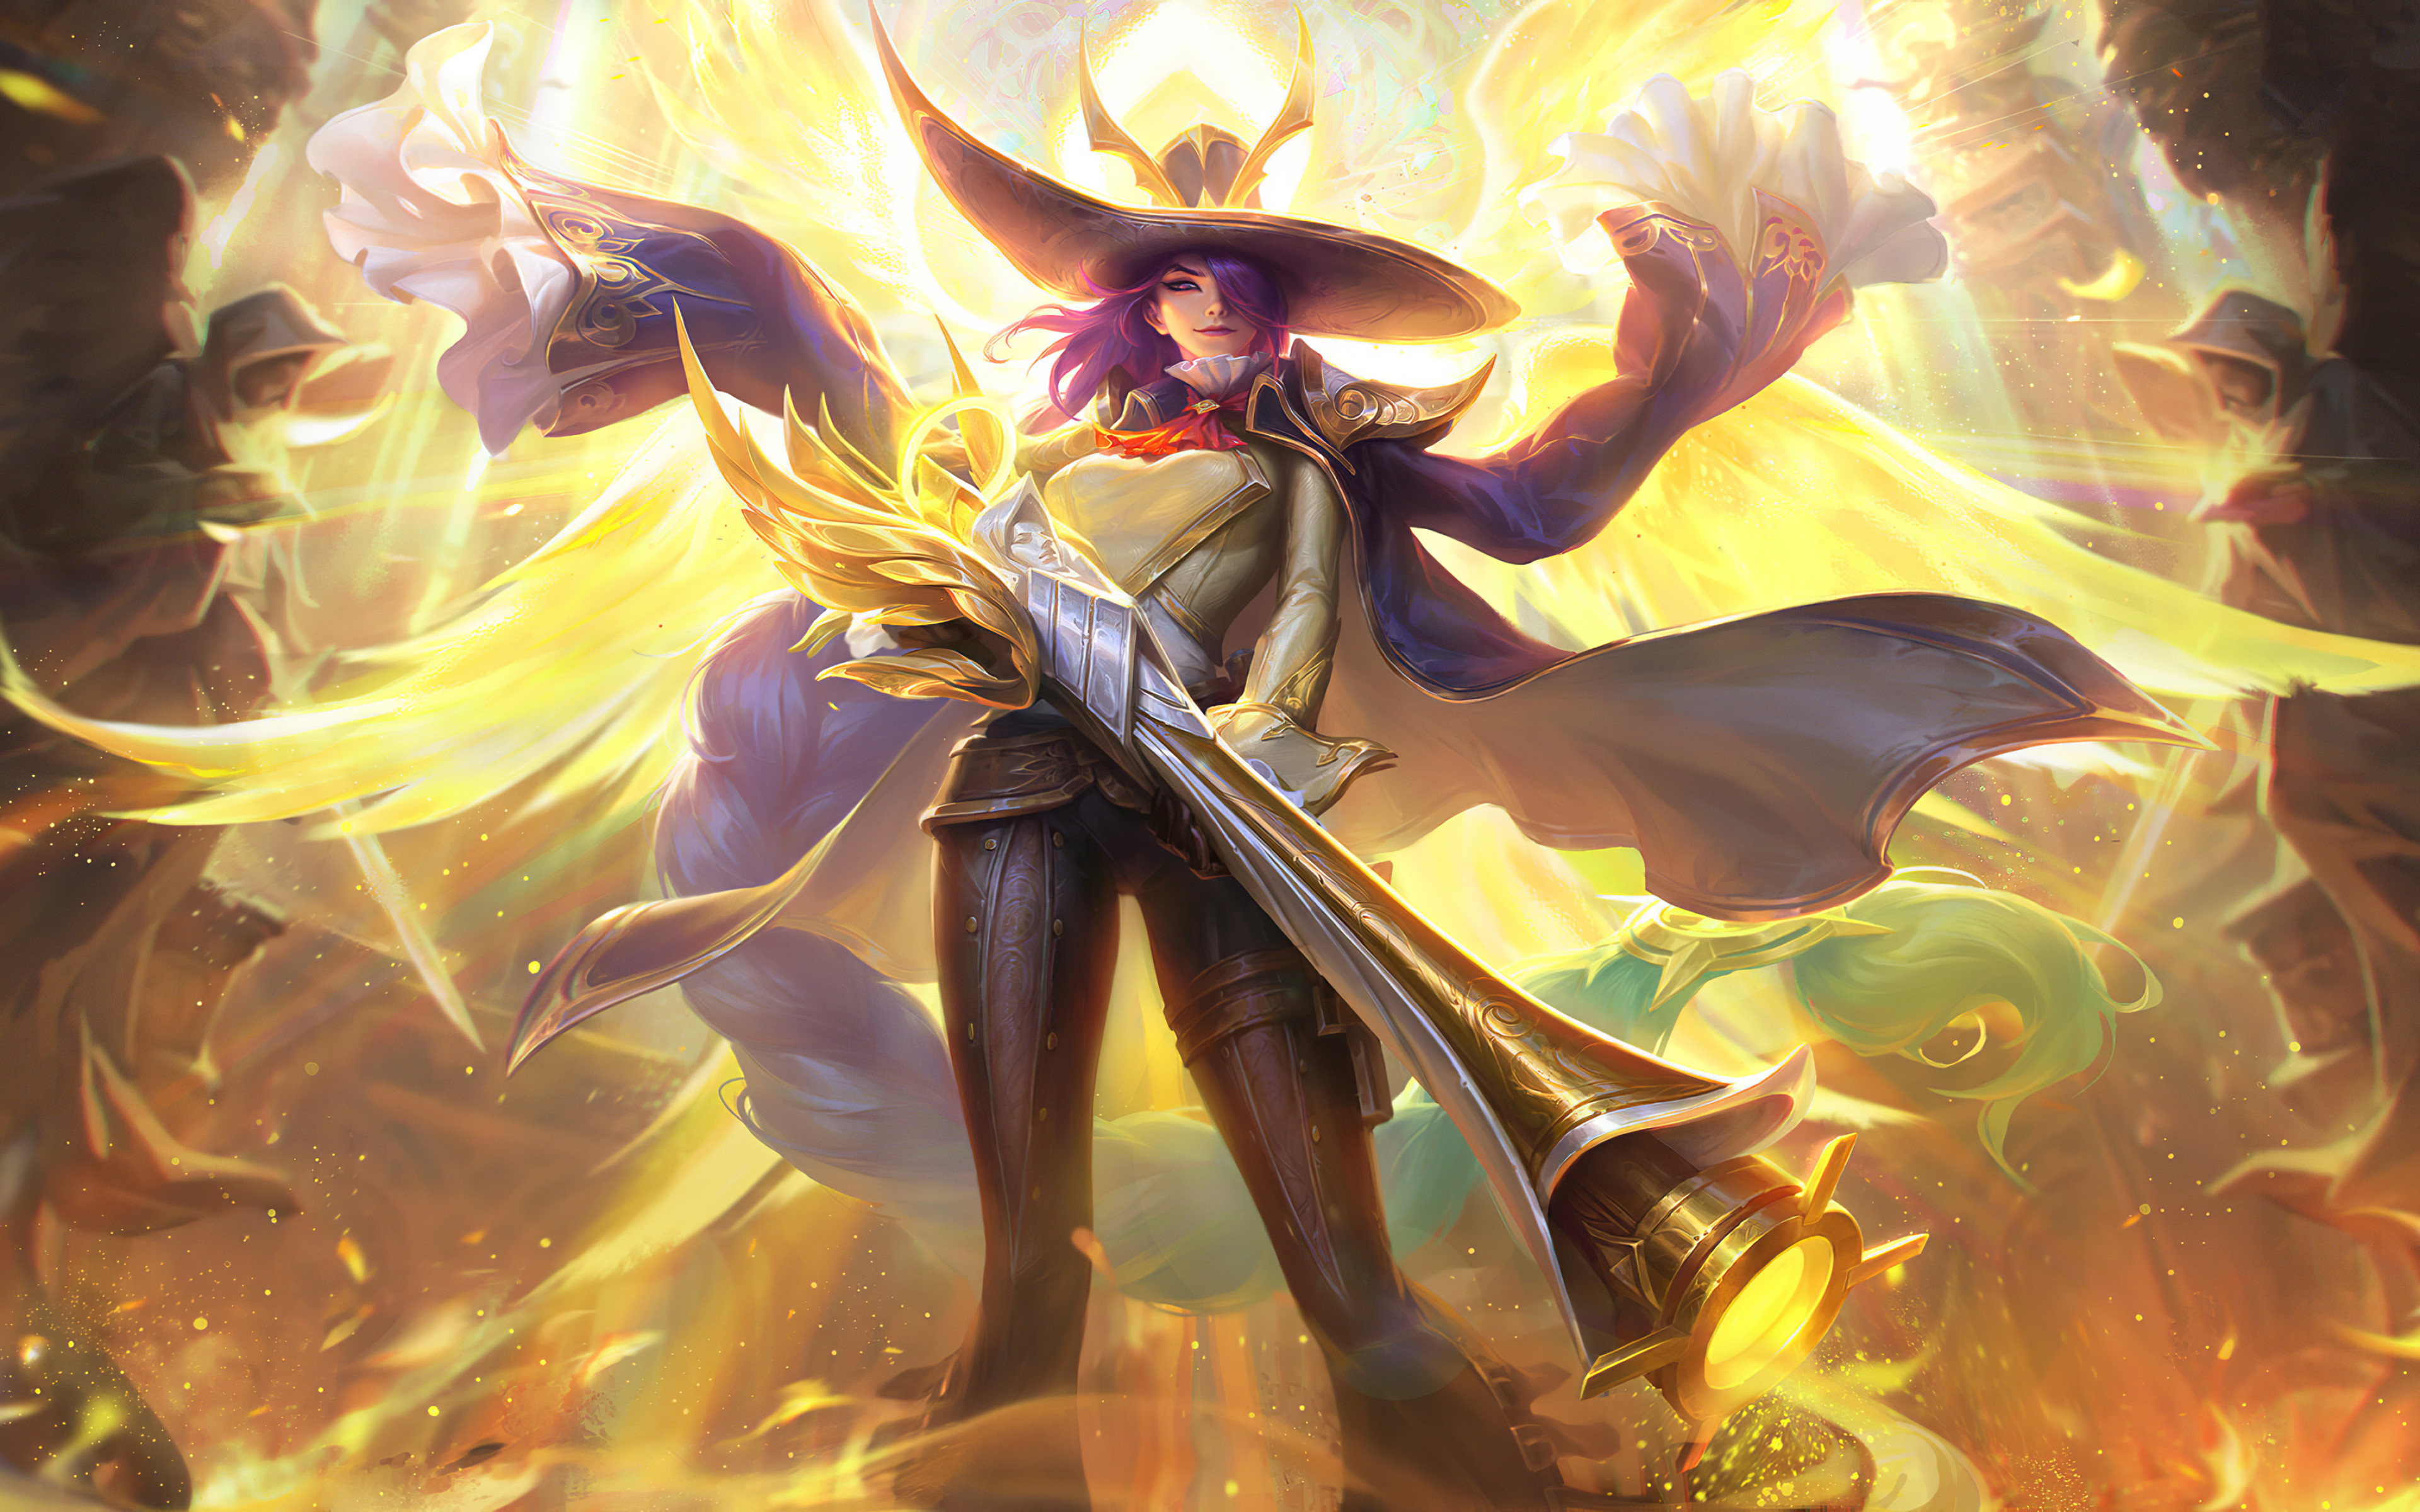 Fondos de pantalla Personaje de Mobile Legends